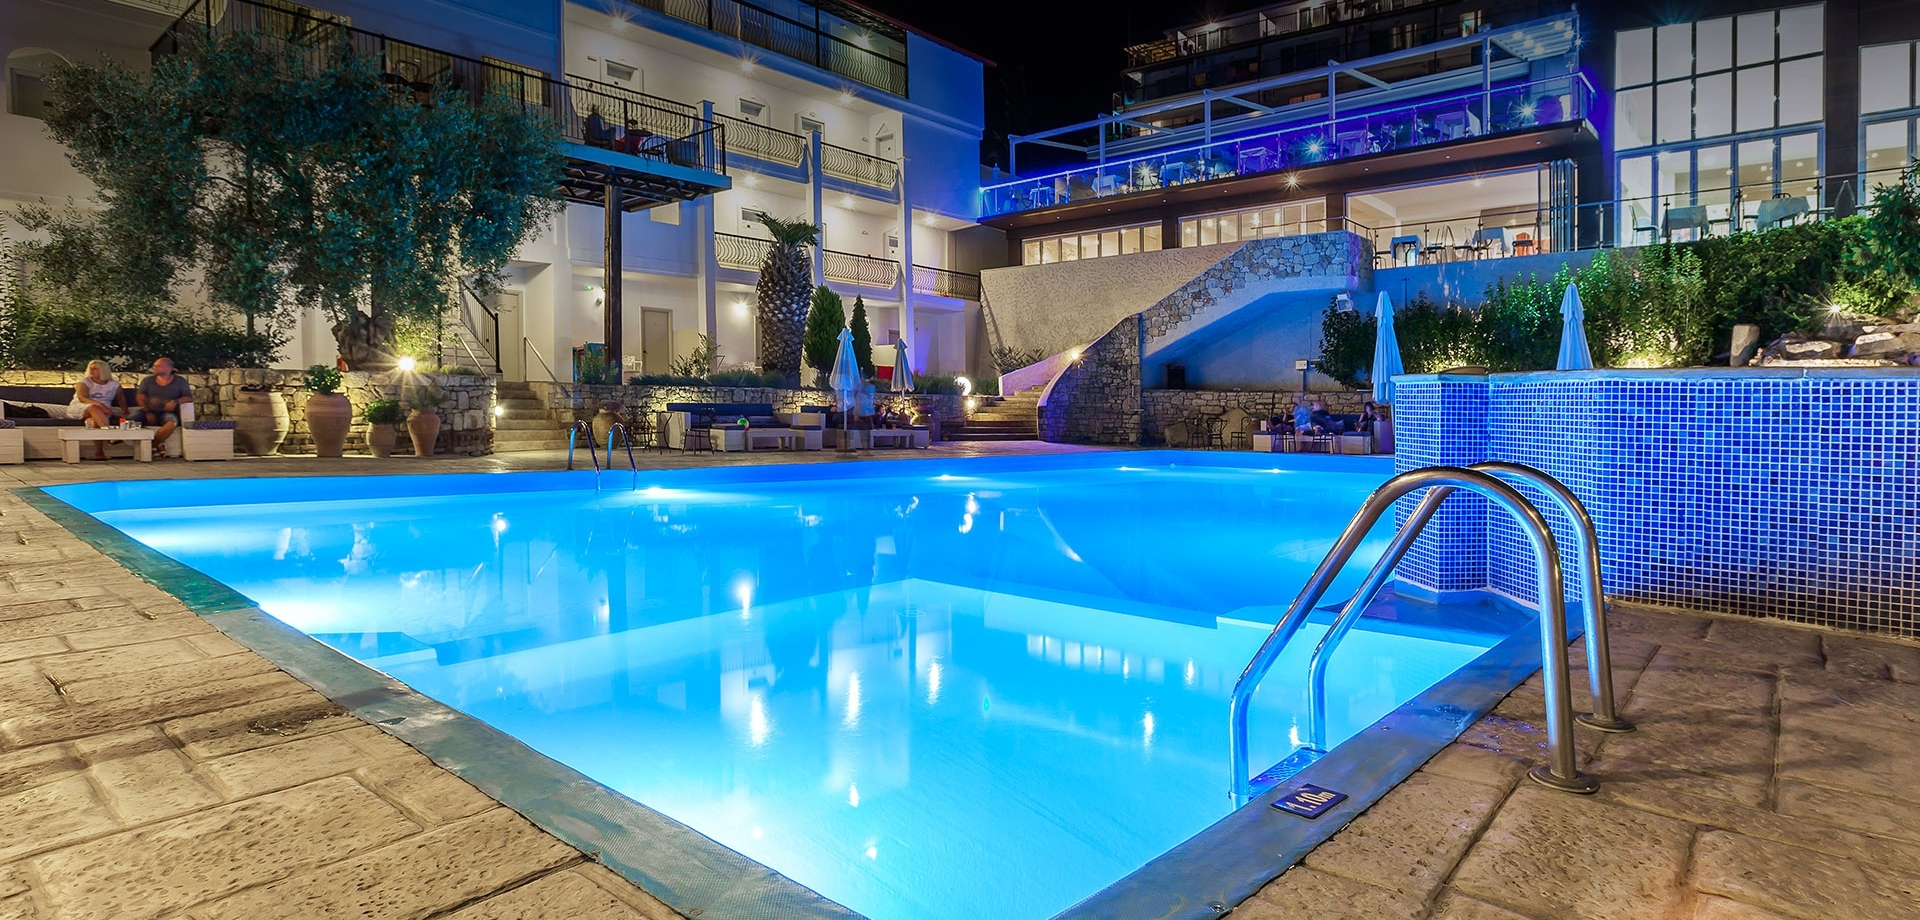 4* Kriopigi Hotel - Κασσάνδρα Χαλκιδικής ✦ -30% ✦ 6